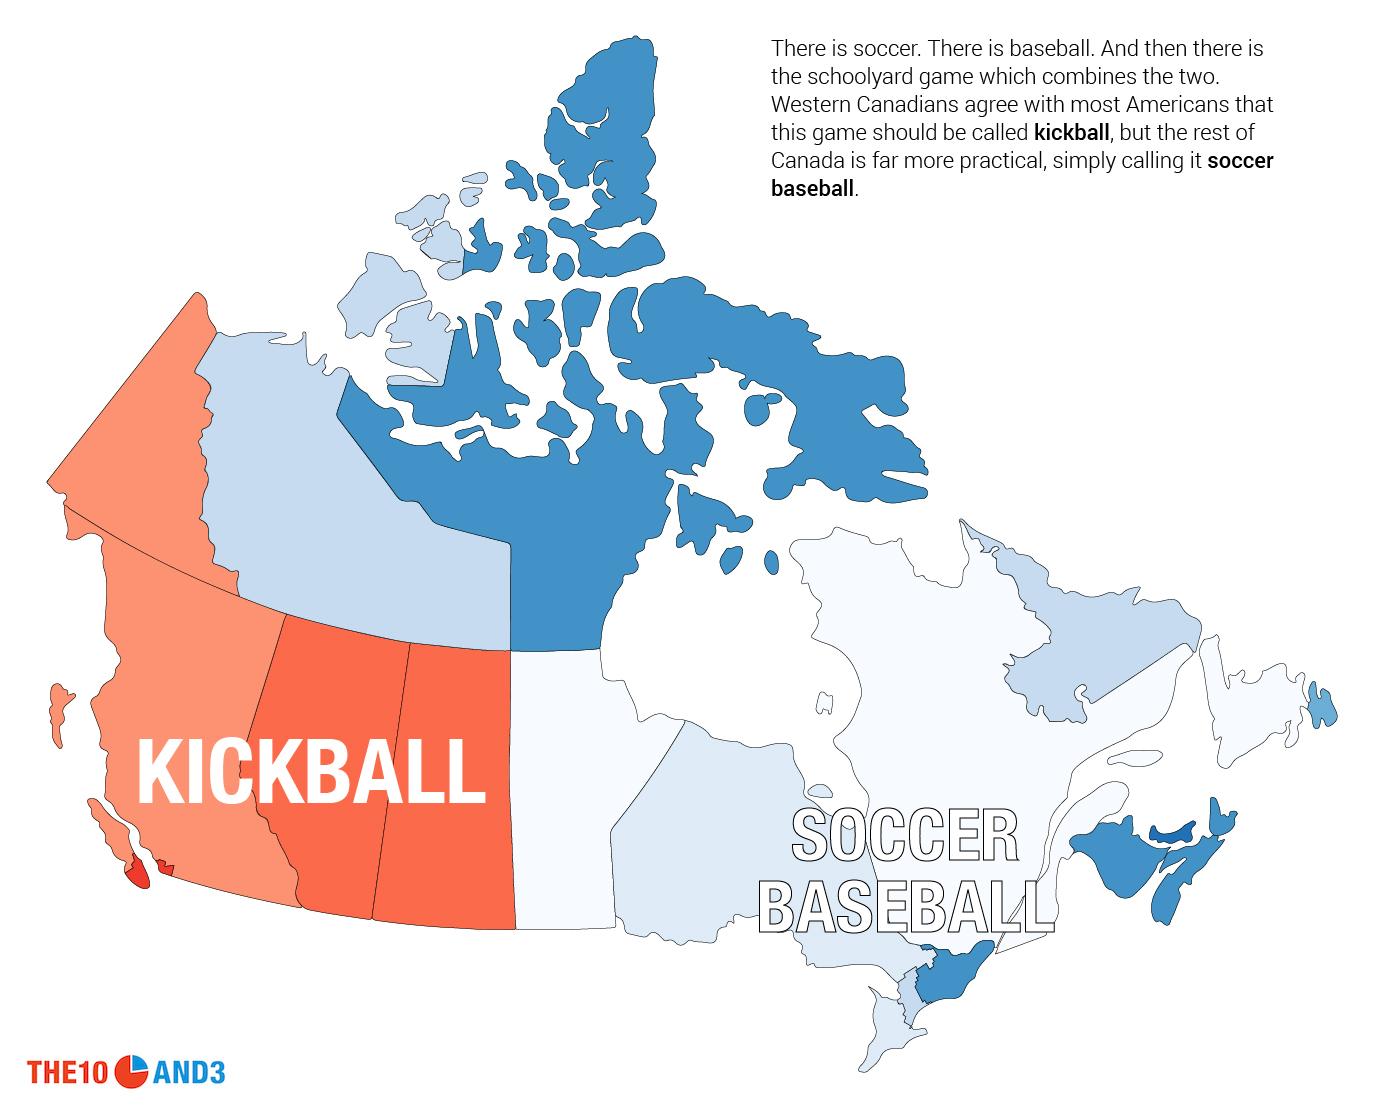 canada u0027s other term for kickball is u0027soccer baseball u0027 which